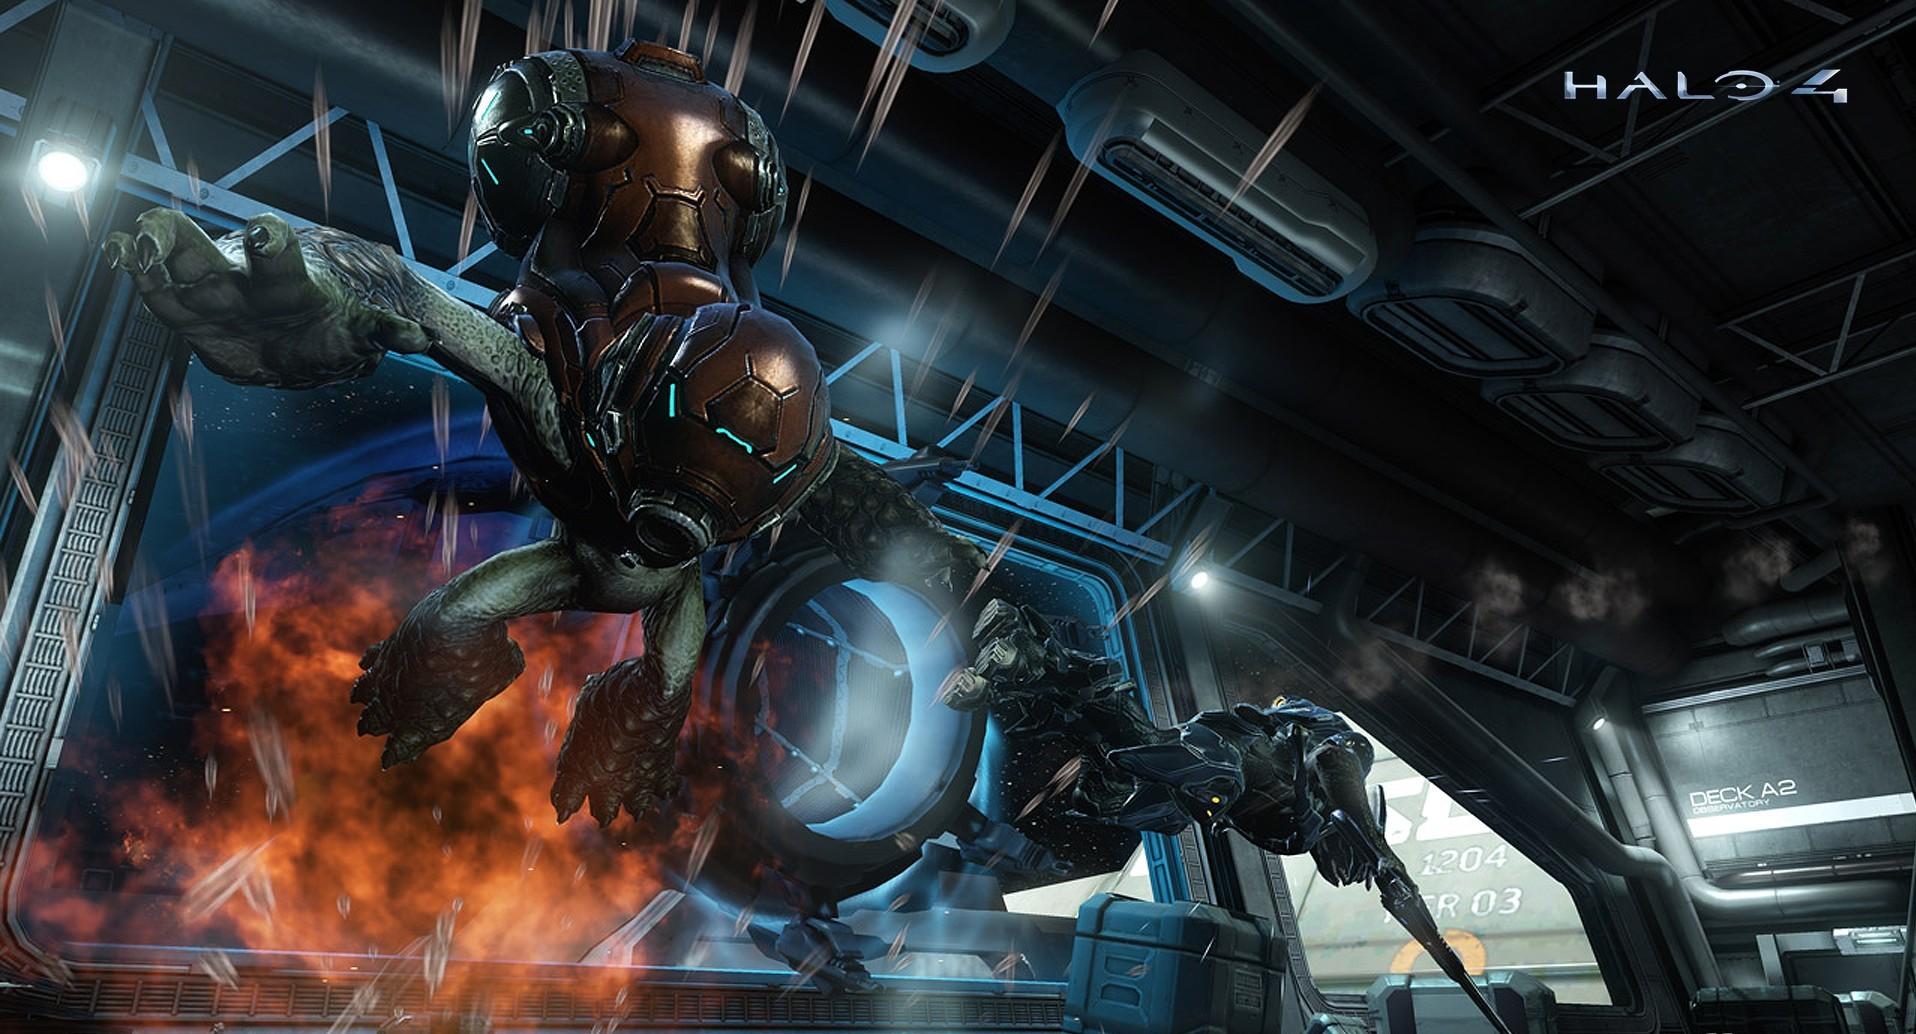 Halo 4 Wallpaper HD Download 1916x1034